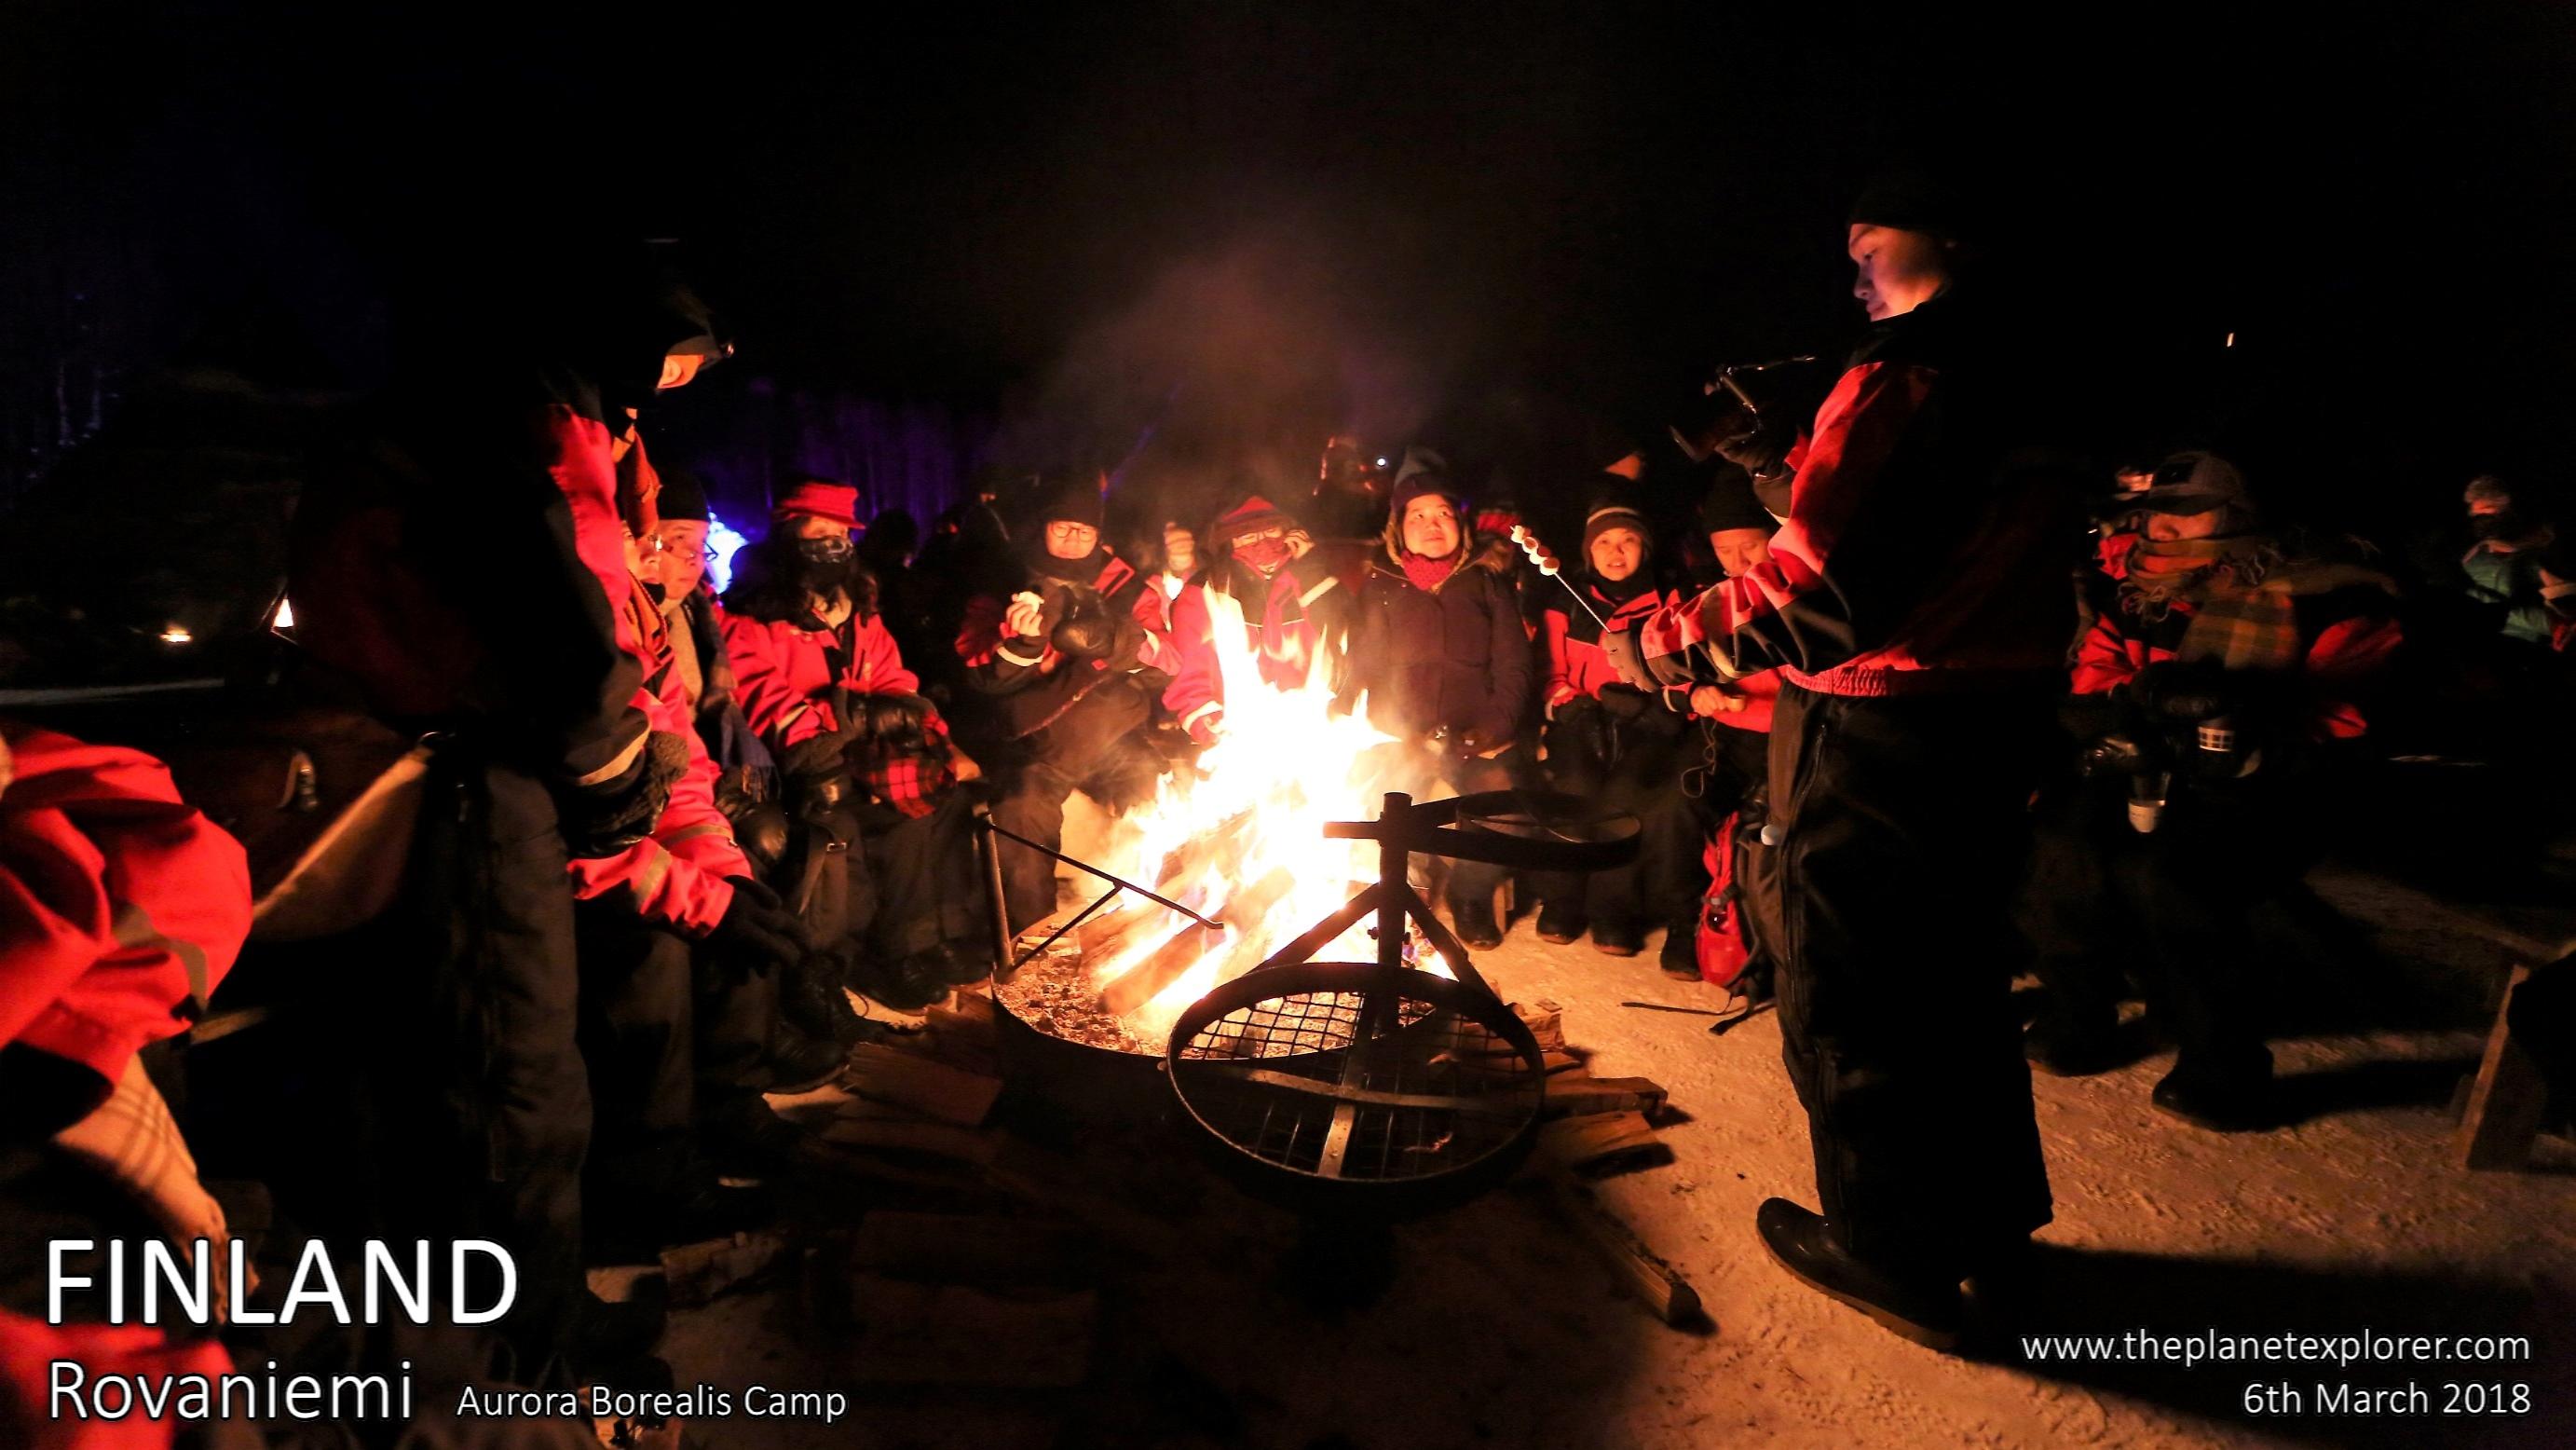 20180306_2104_Finland_Rovaniemi_Aurora Borealis Camp_Q03A9813_Canon 5DMk3_LR_@www